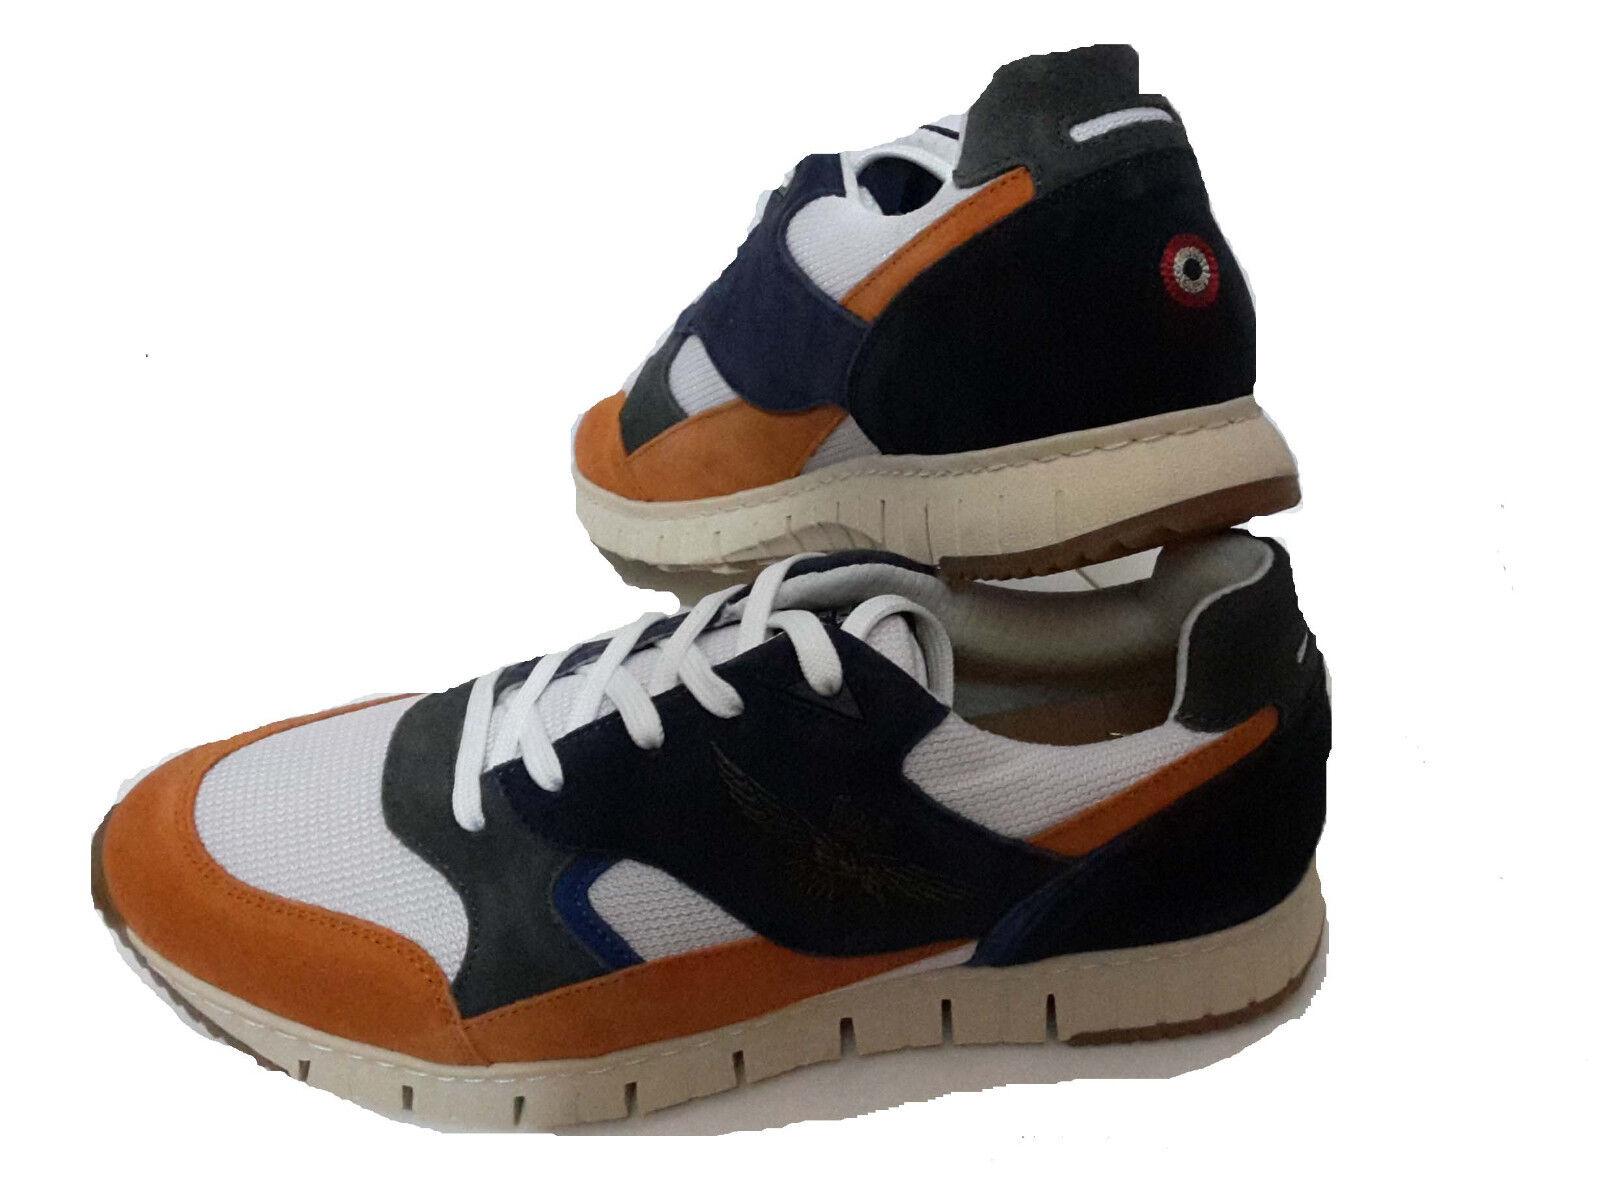 Scarpe casual da uomo  SCARPE SNEAKERS AERONAUTICA MILITARE SC140CT arancione blu shoes estate18